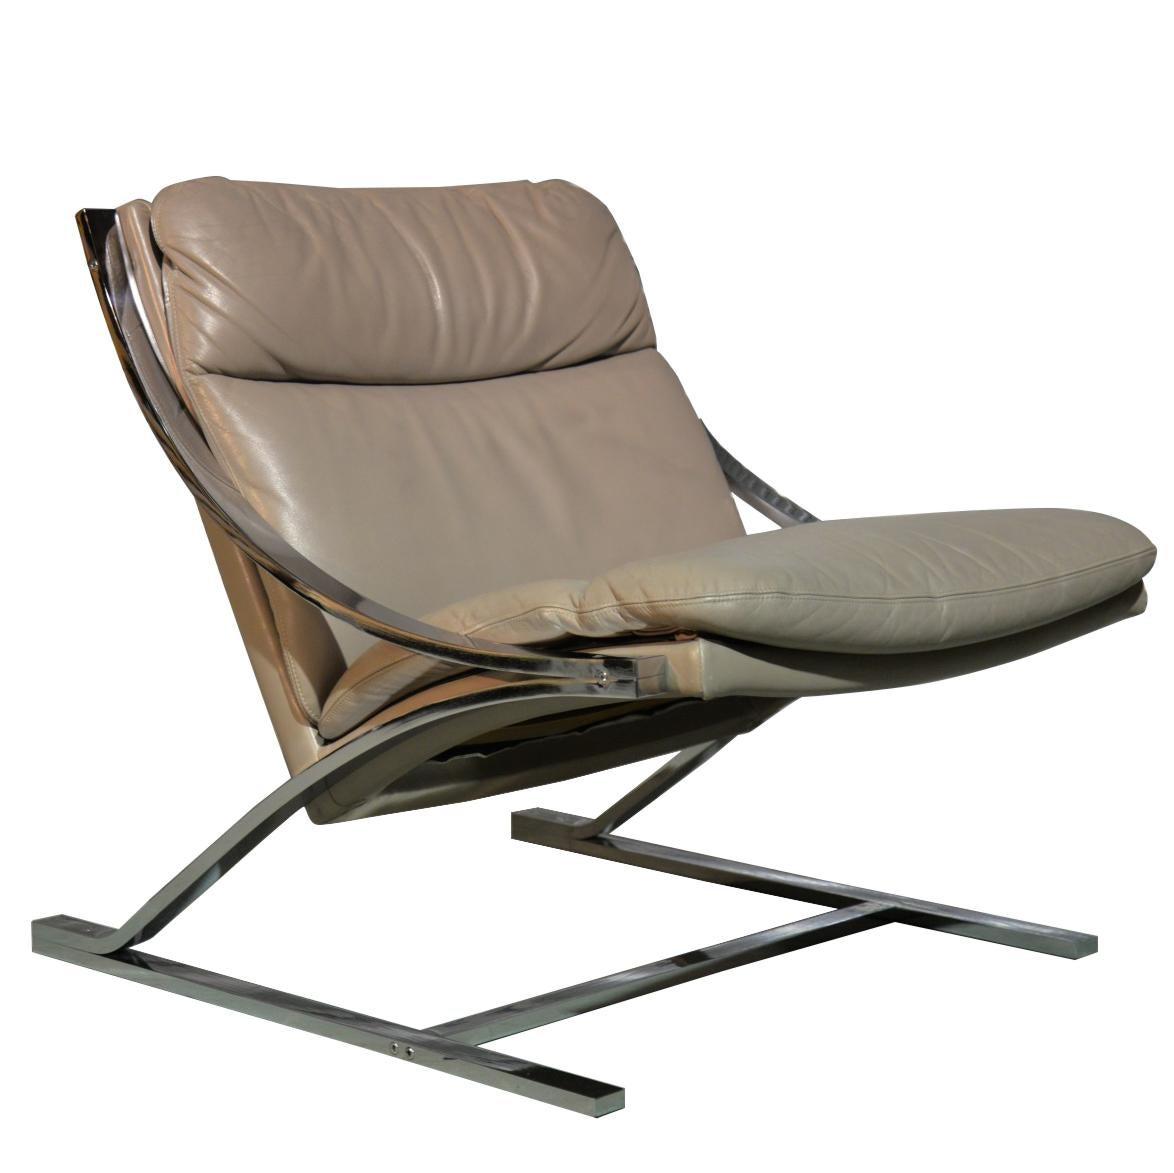 "Paul Tuttle ""Zeta"" Lounge Chair for Strassle of Switzerland, 1968"